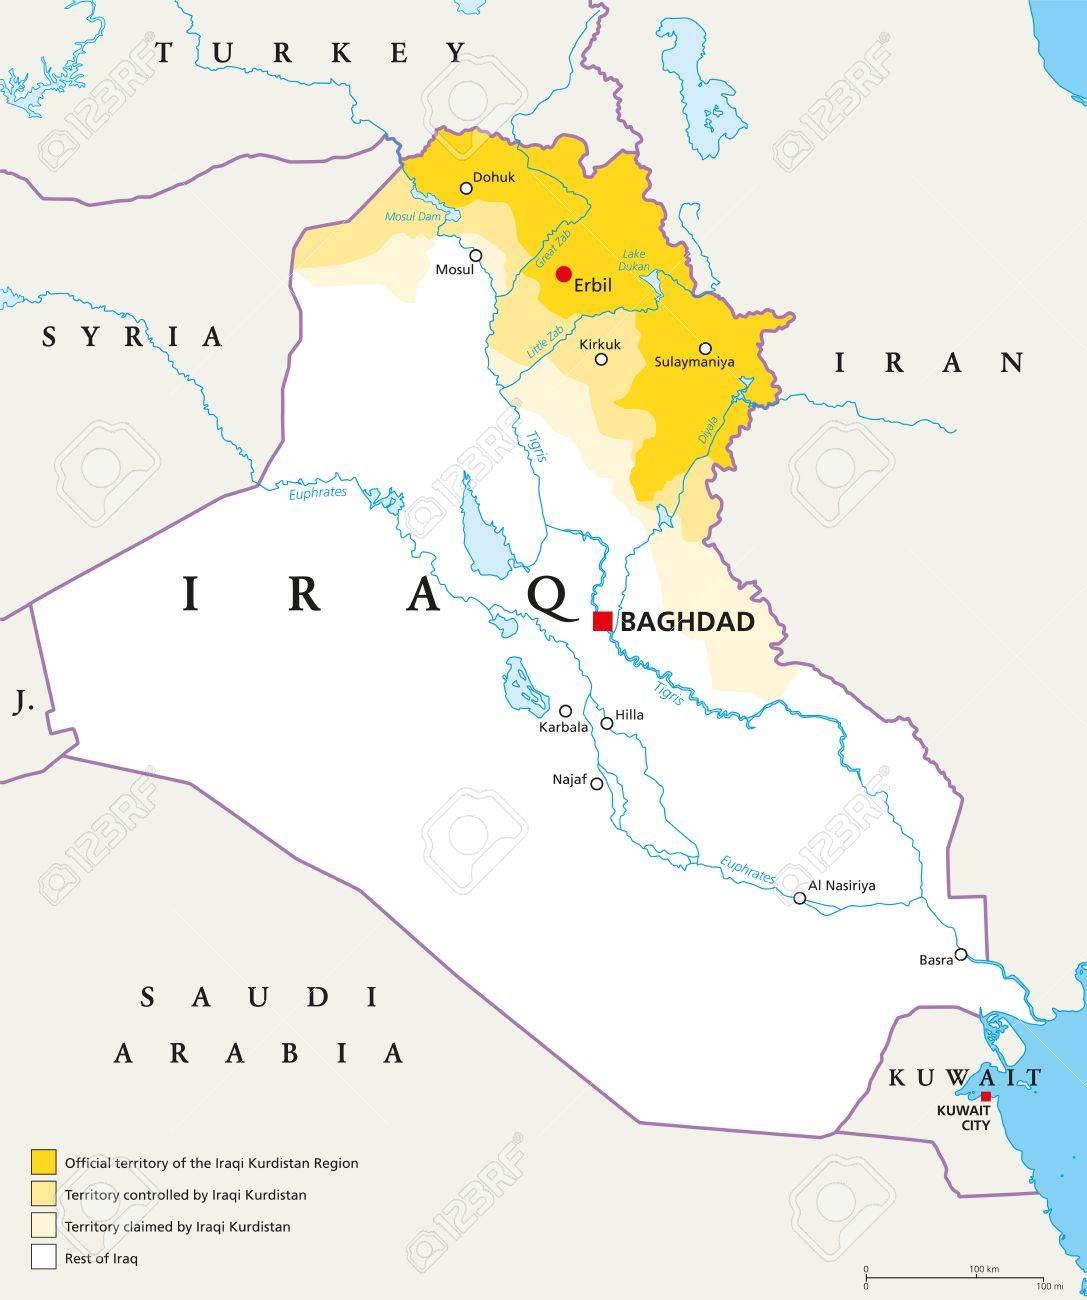 Iraqi Kurdistan Region political map. Official, controlled and.. on dead sea map, chechnya map, kashmir map, erbil map, kyrgyzstan map, baluchistan map, lebanon map, iraqi kurdistan, uzbekistan map, assyria map, kurdish population map, kurdish language, ukraine map, kurdish jews, turkish kurdistan, iraq map, afghanistan map, iranian kurdistan, halabja poison gas attack, kurdistan province, kurdish people, turkey map, kuwait map, baghdad map, kurdish flag, south ossetia map, palestine map, zagros mountains, persian people, iran map, scotland map,